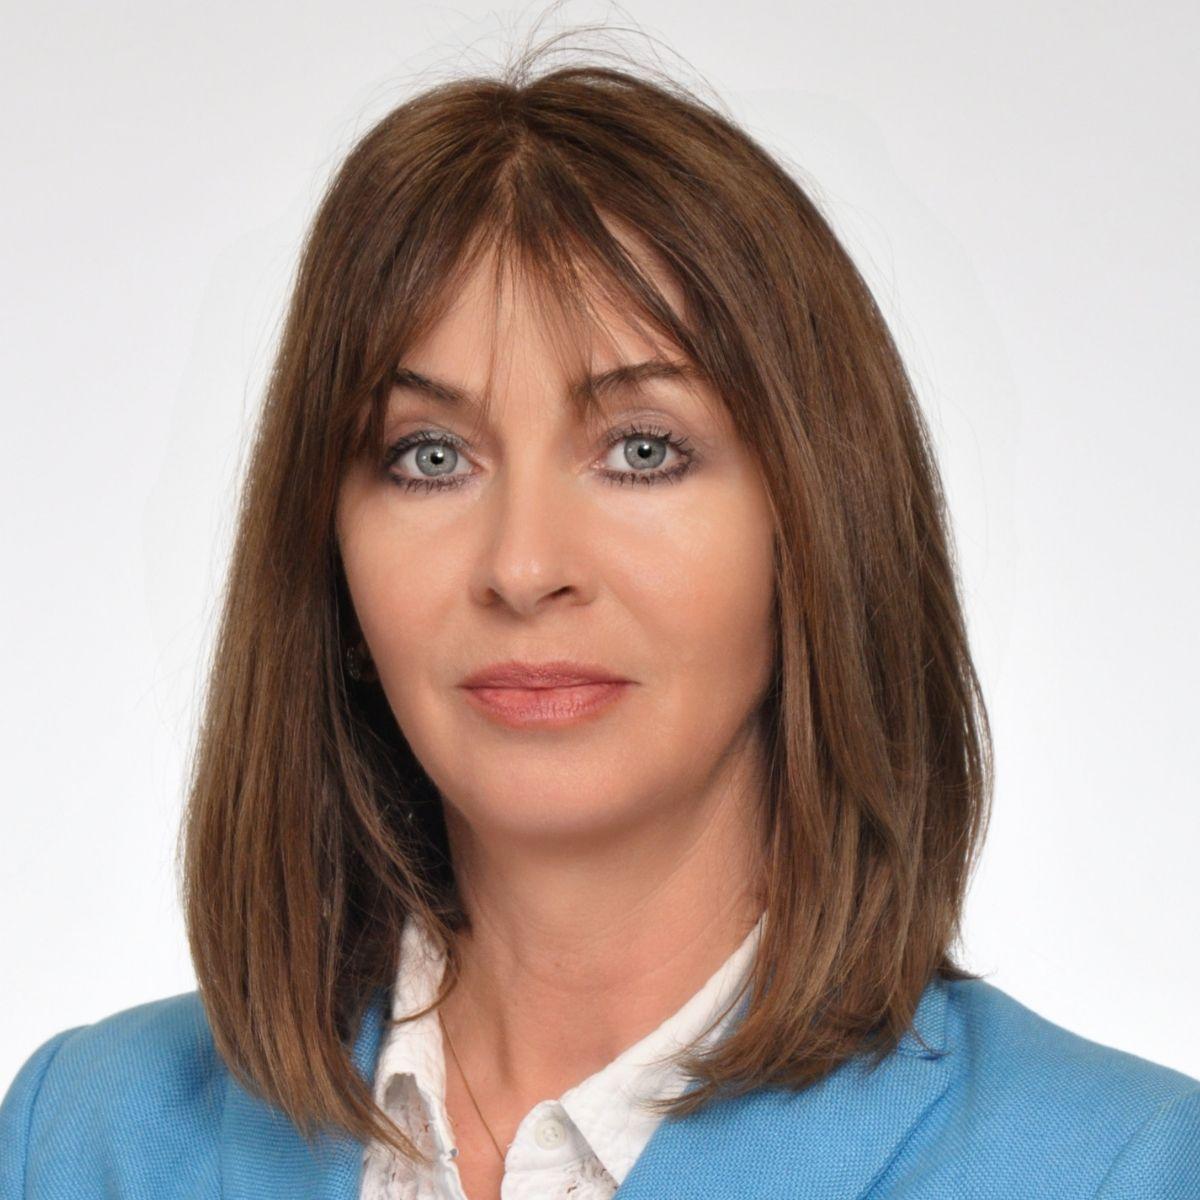 Юлияна Куртева